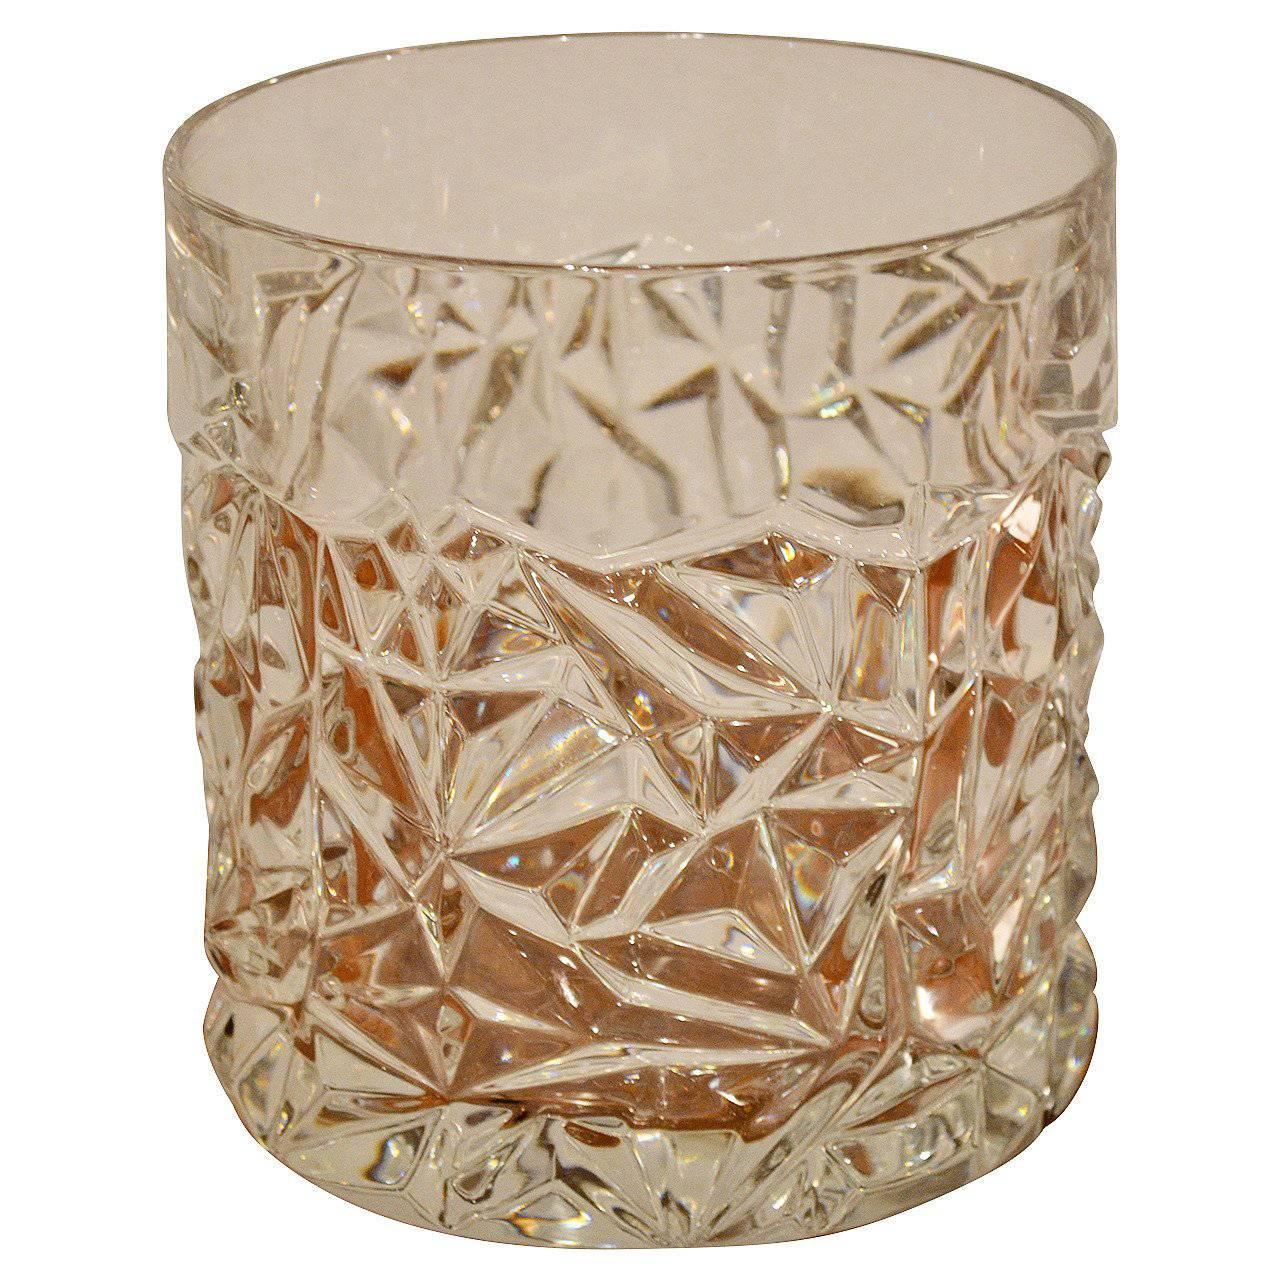 "Tiffany & Co. Mid-Century Modern ""Rock Cut"" Crystal Ice Bucket"